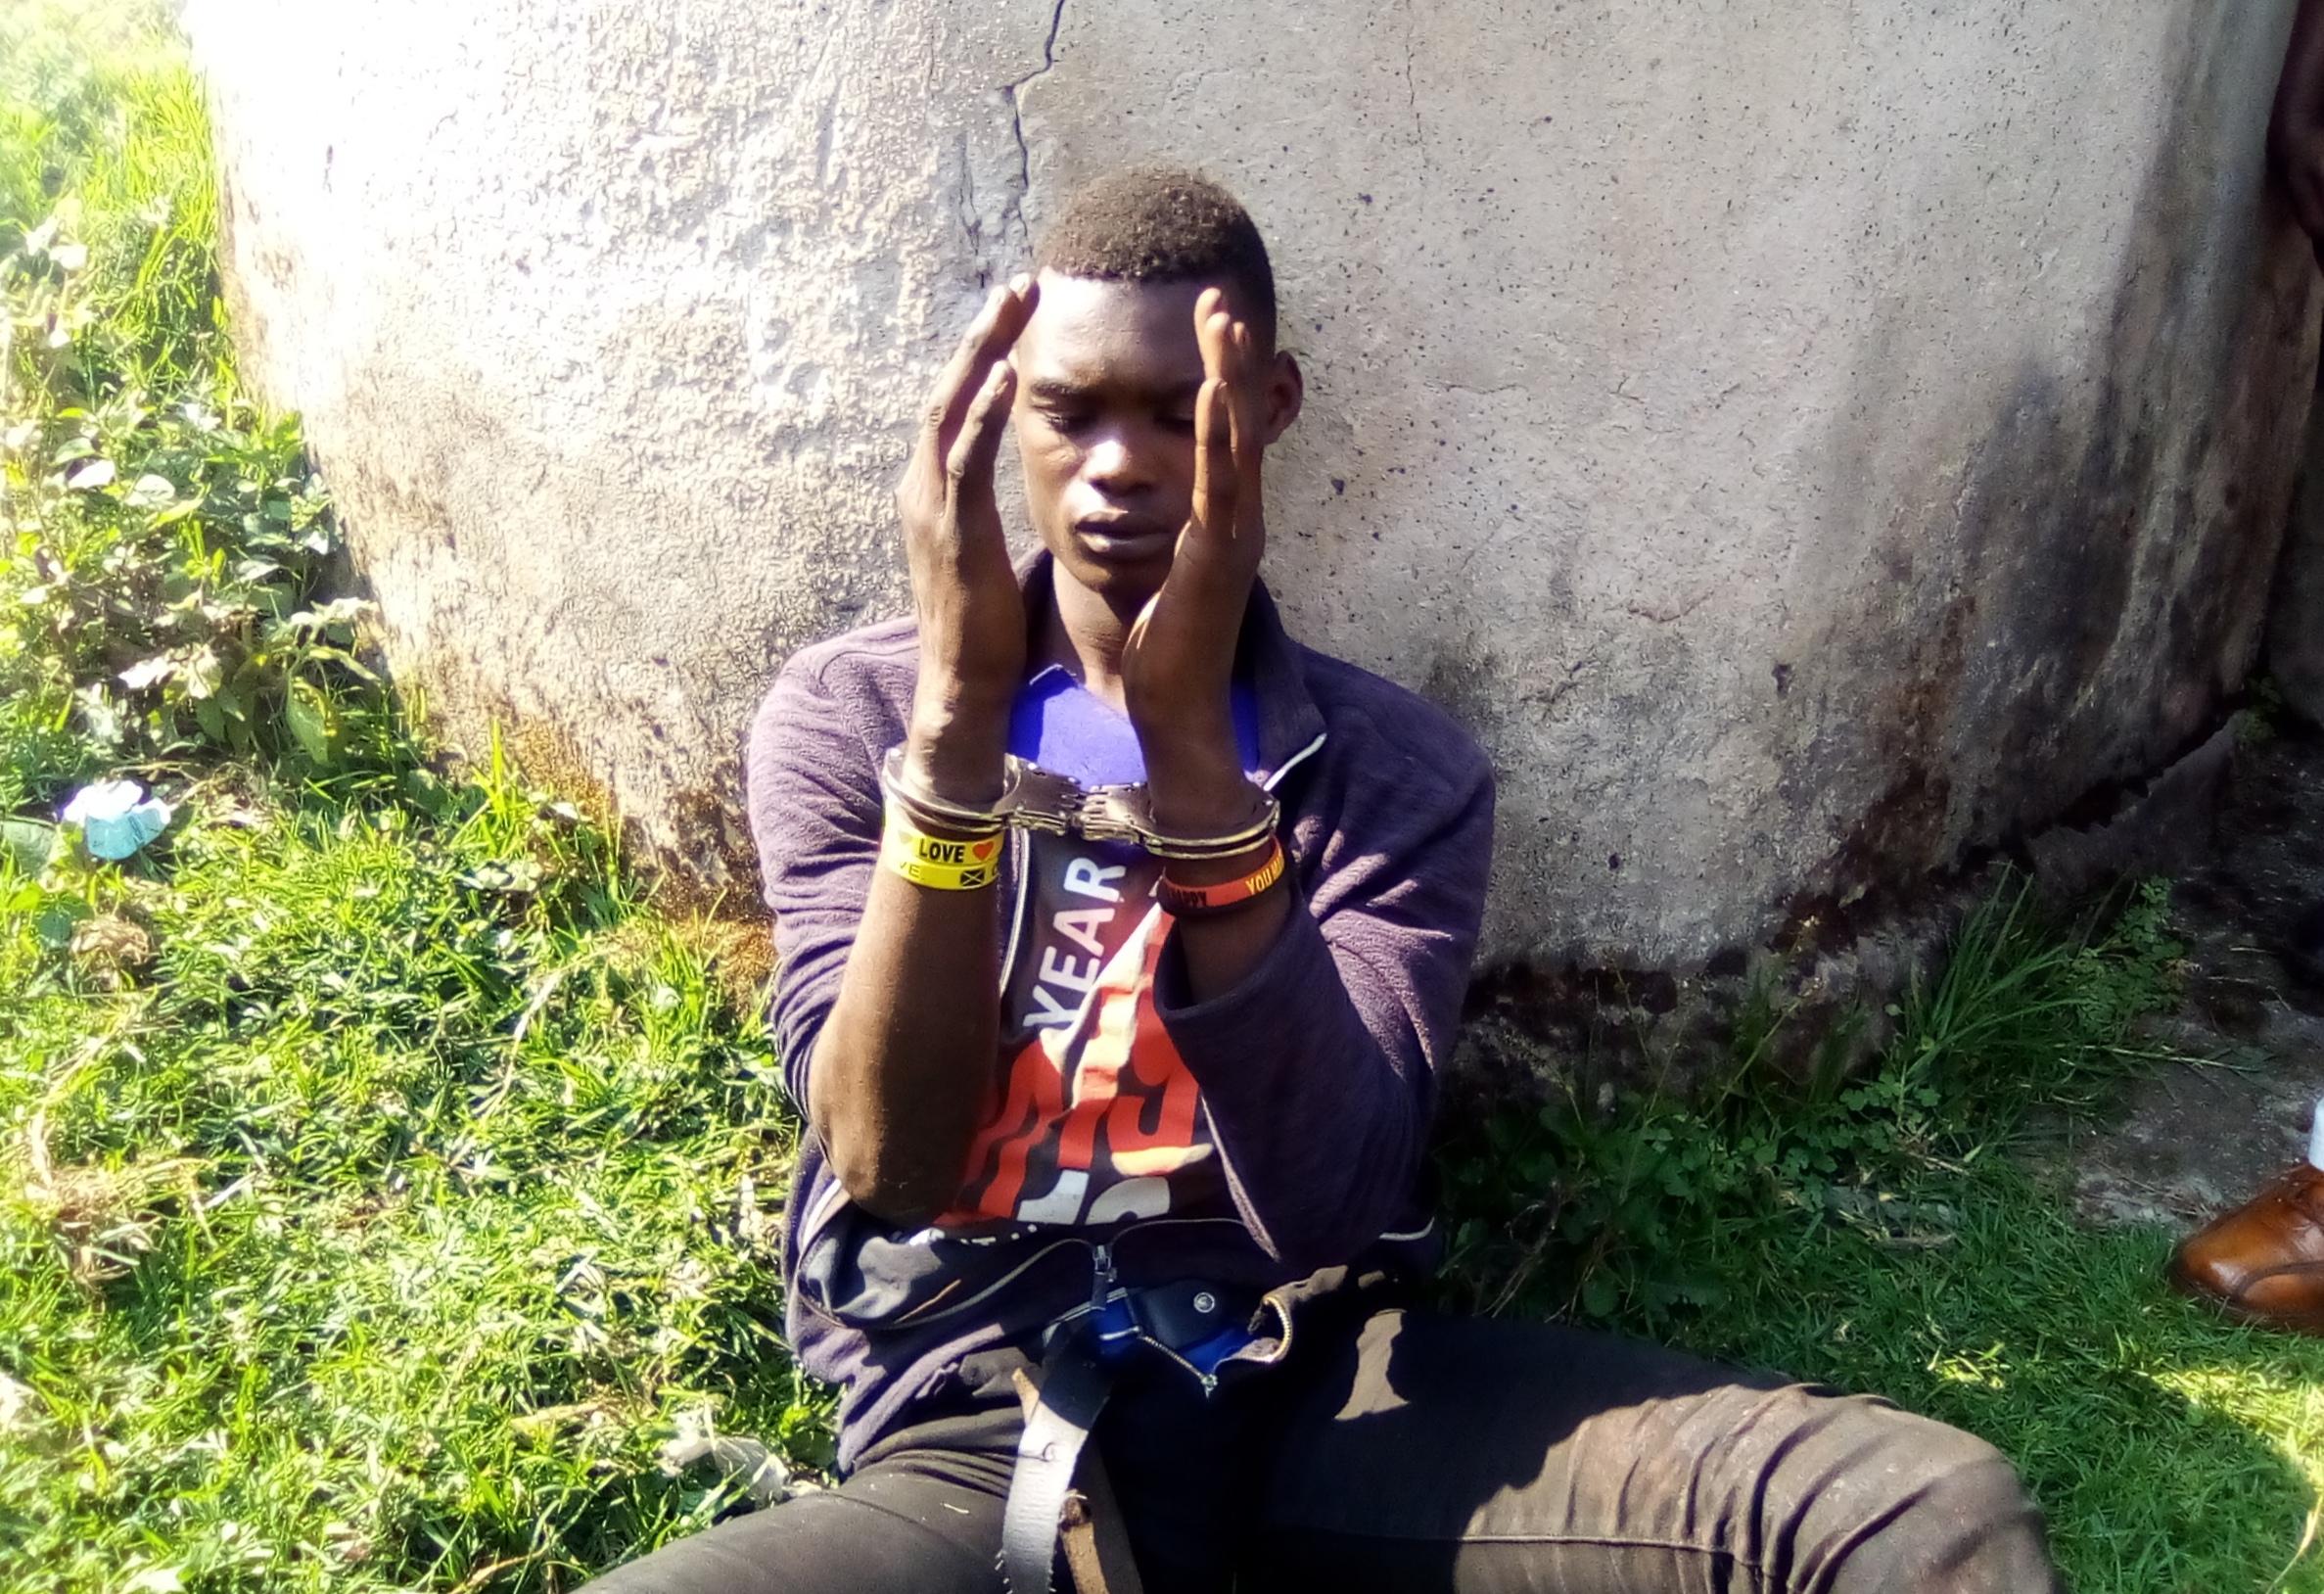 Turinayo Gerald, the suspected thief